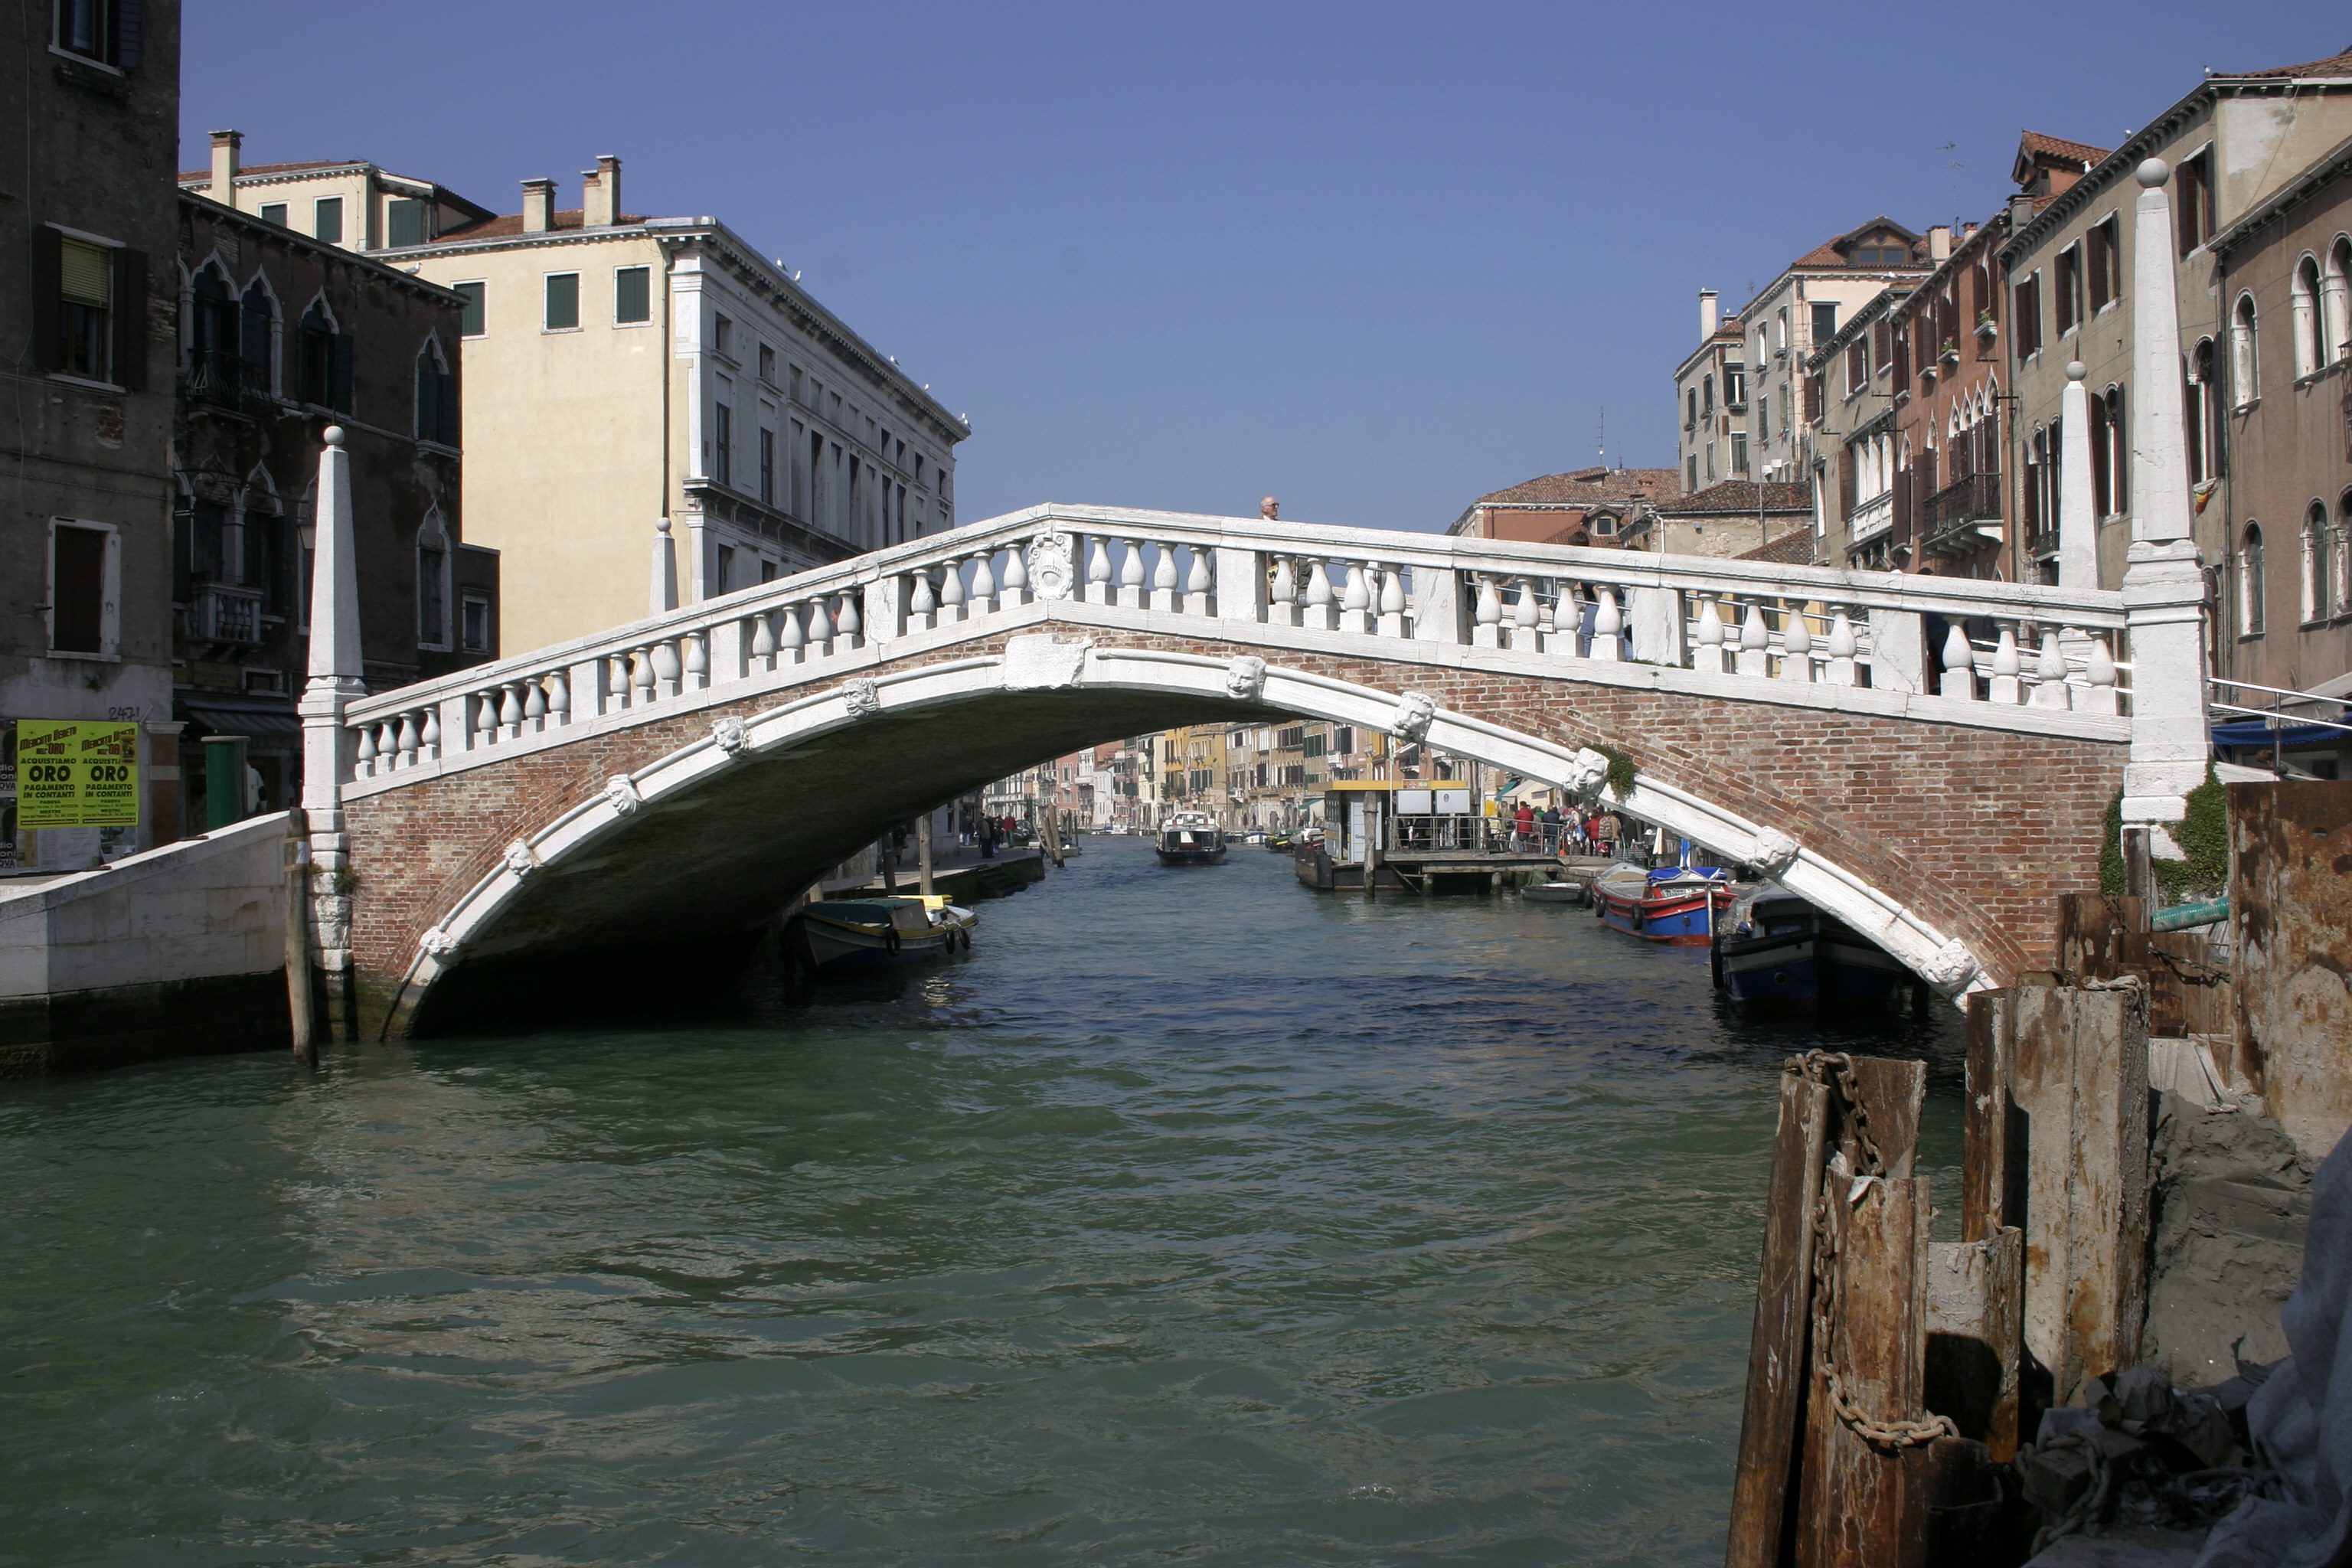 http://upload.wikimedia.org/wikipedia/commons/b/b0/Venice_-_Ponte_delle_Guglie.jpg